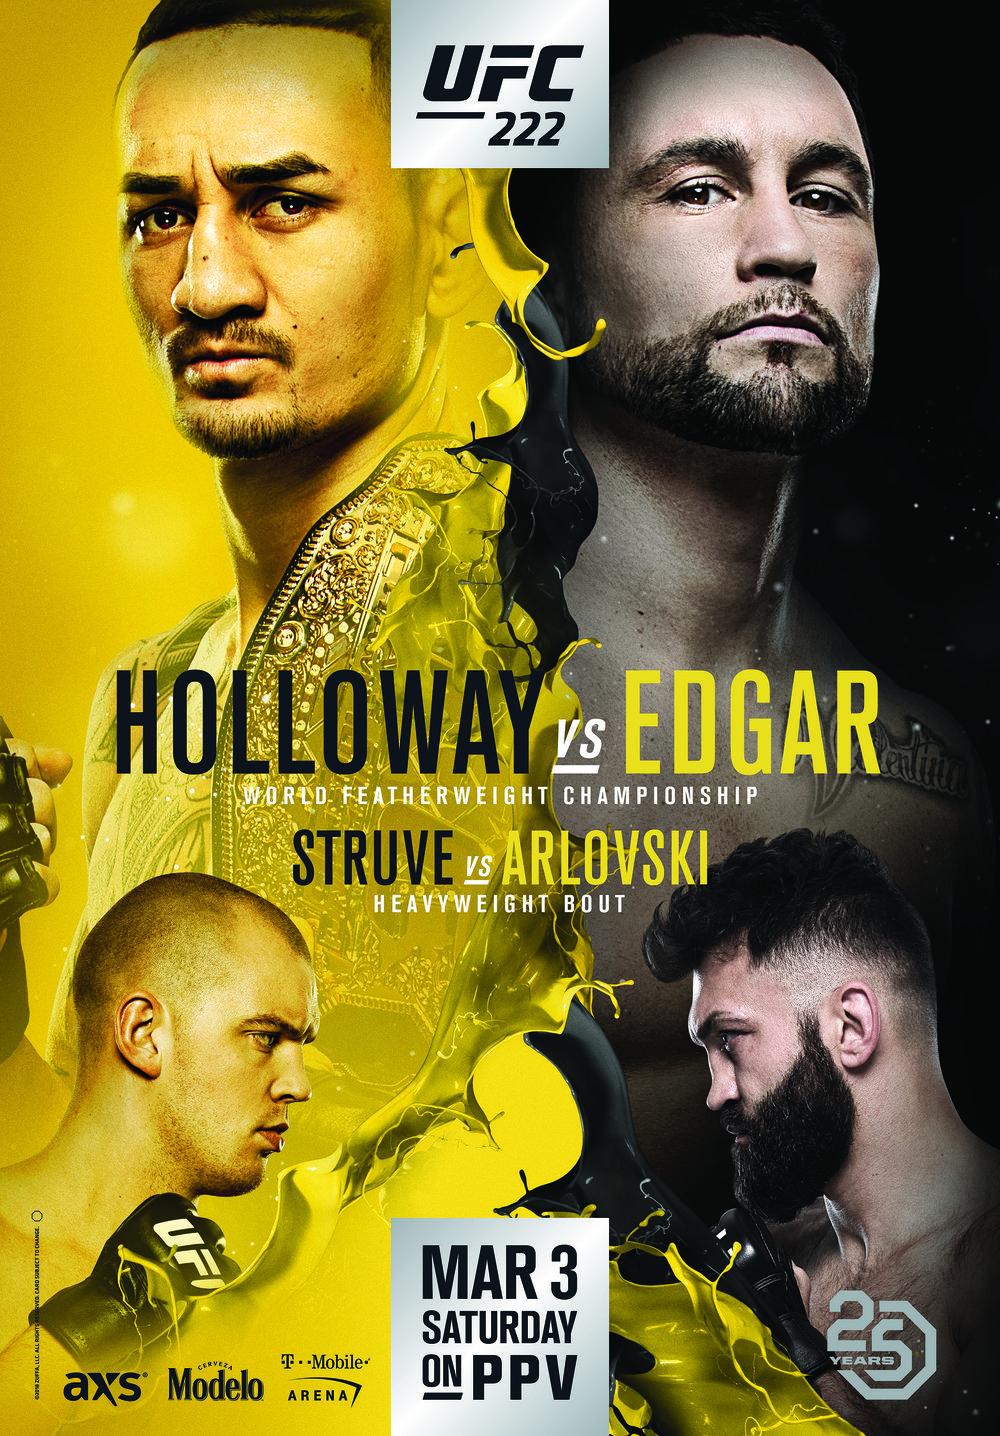 UFC_222_poster_english.jpg